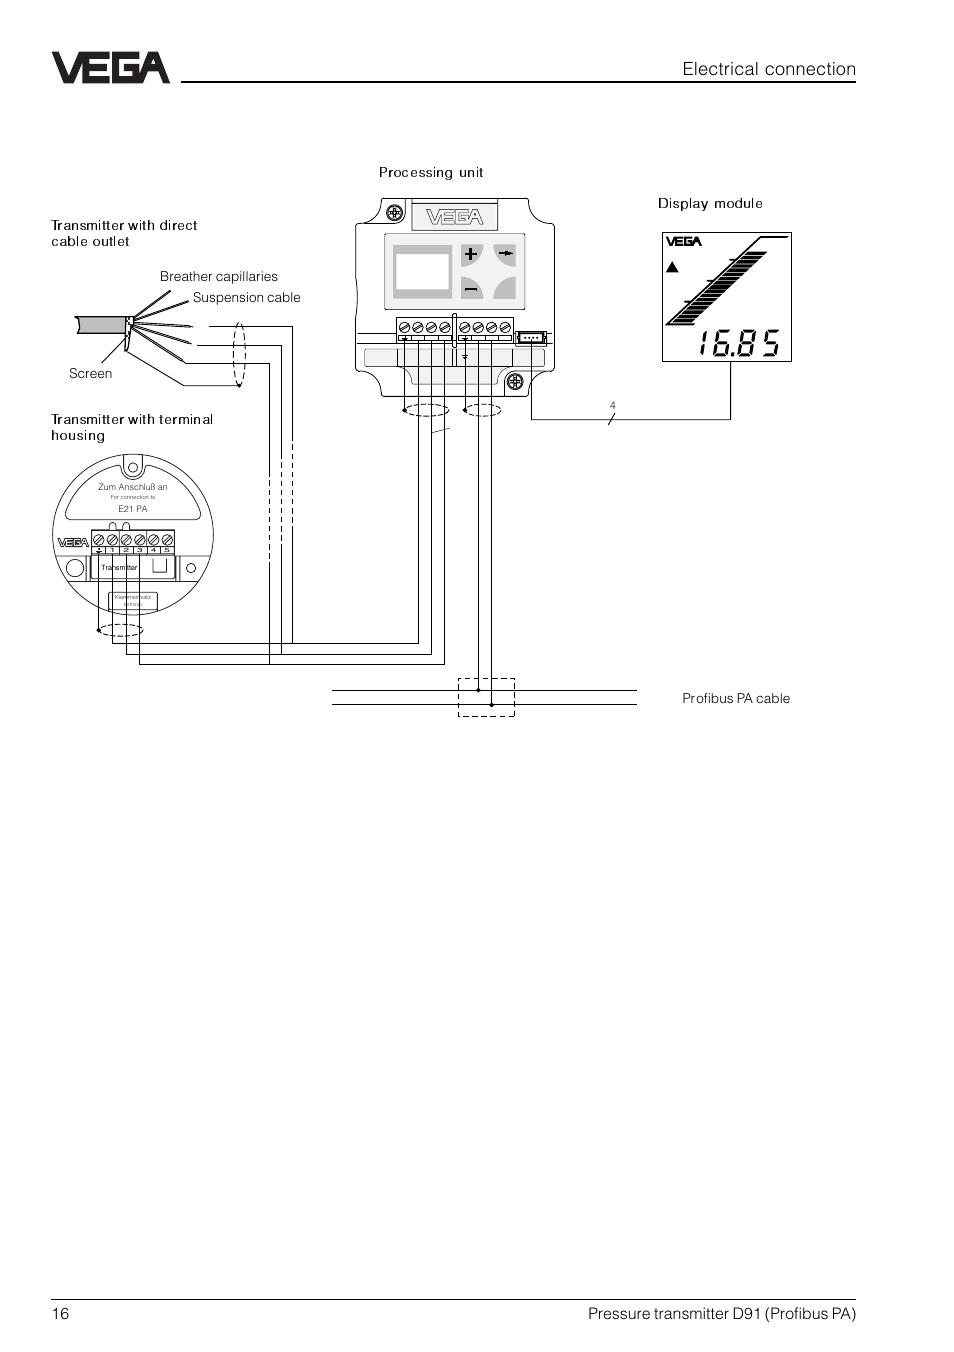 medium resolution of profibus pa wiring diagram just wiring diagram pa 28 wiring diagram 2 wiring plan electrical